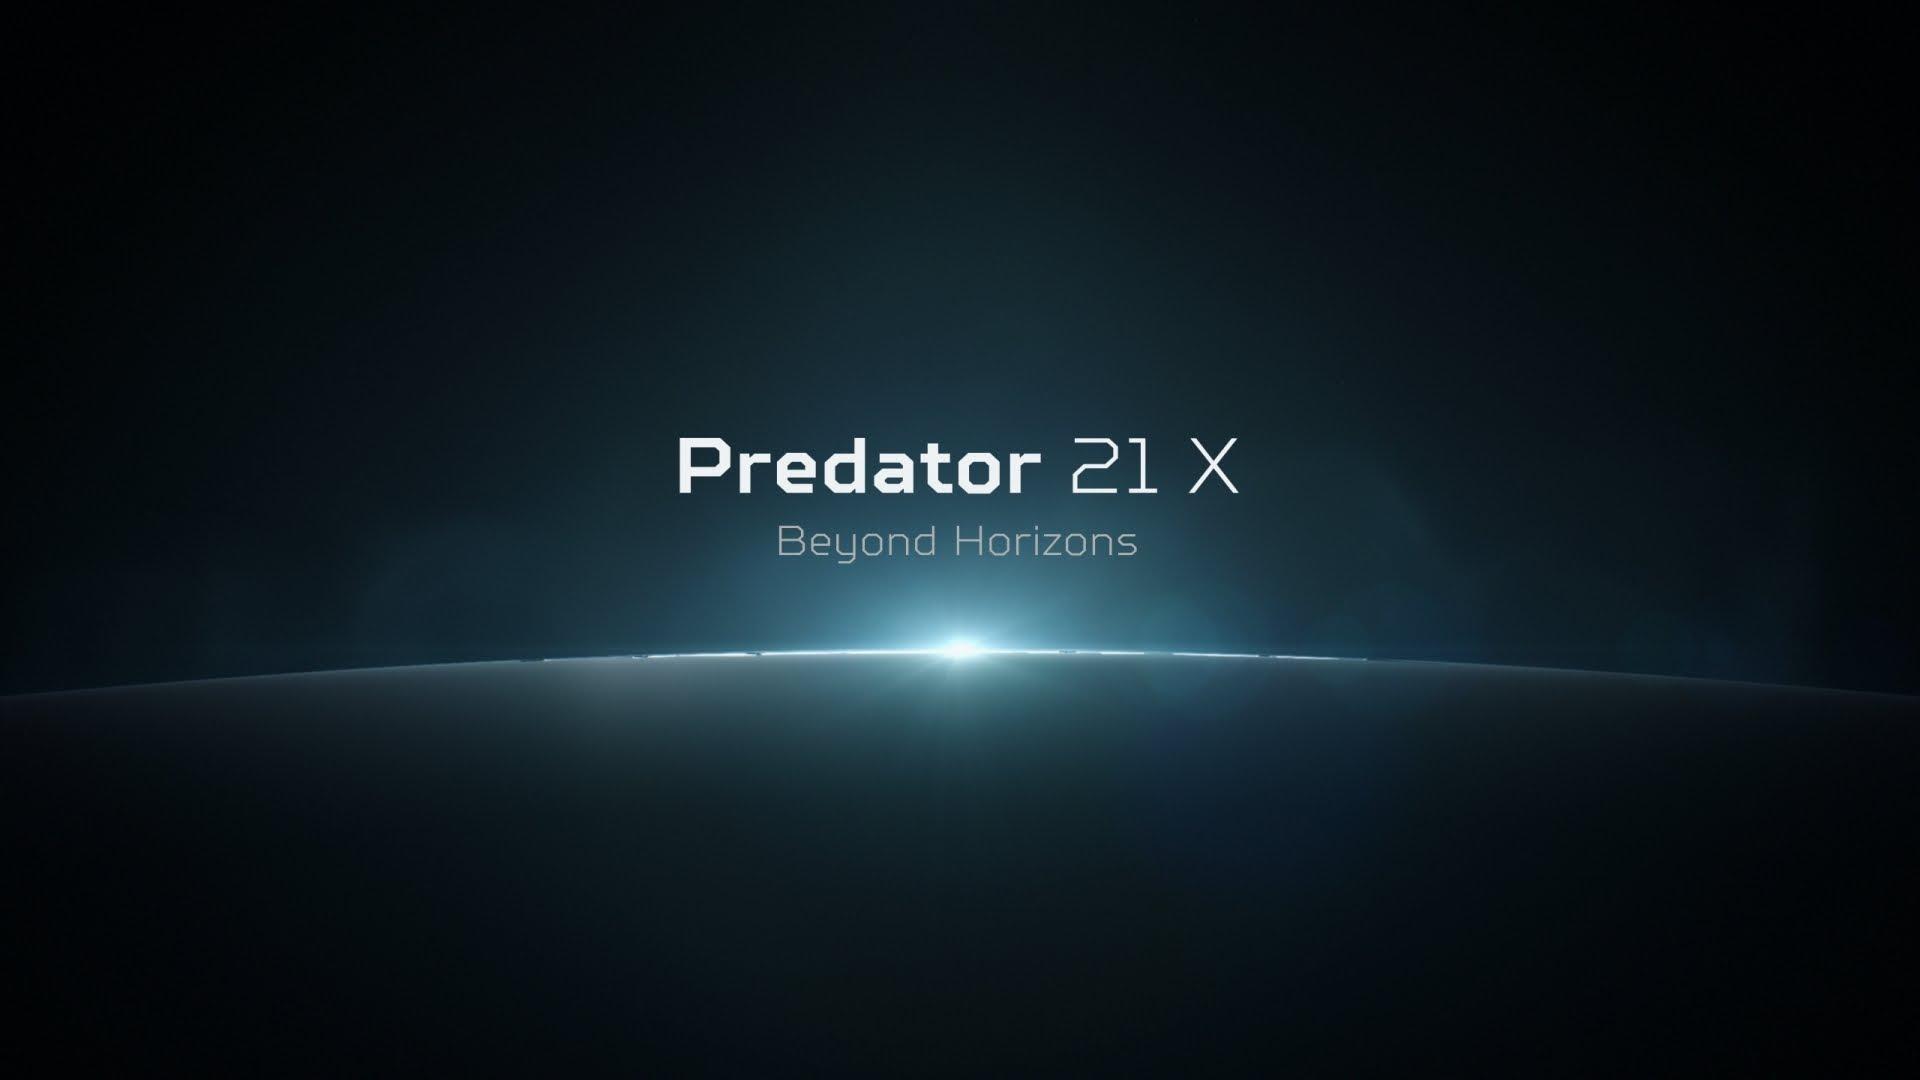 predator: Predator Helios 300 Wallpaper